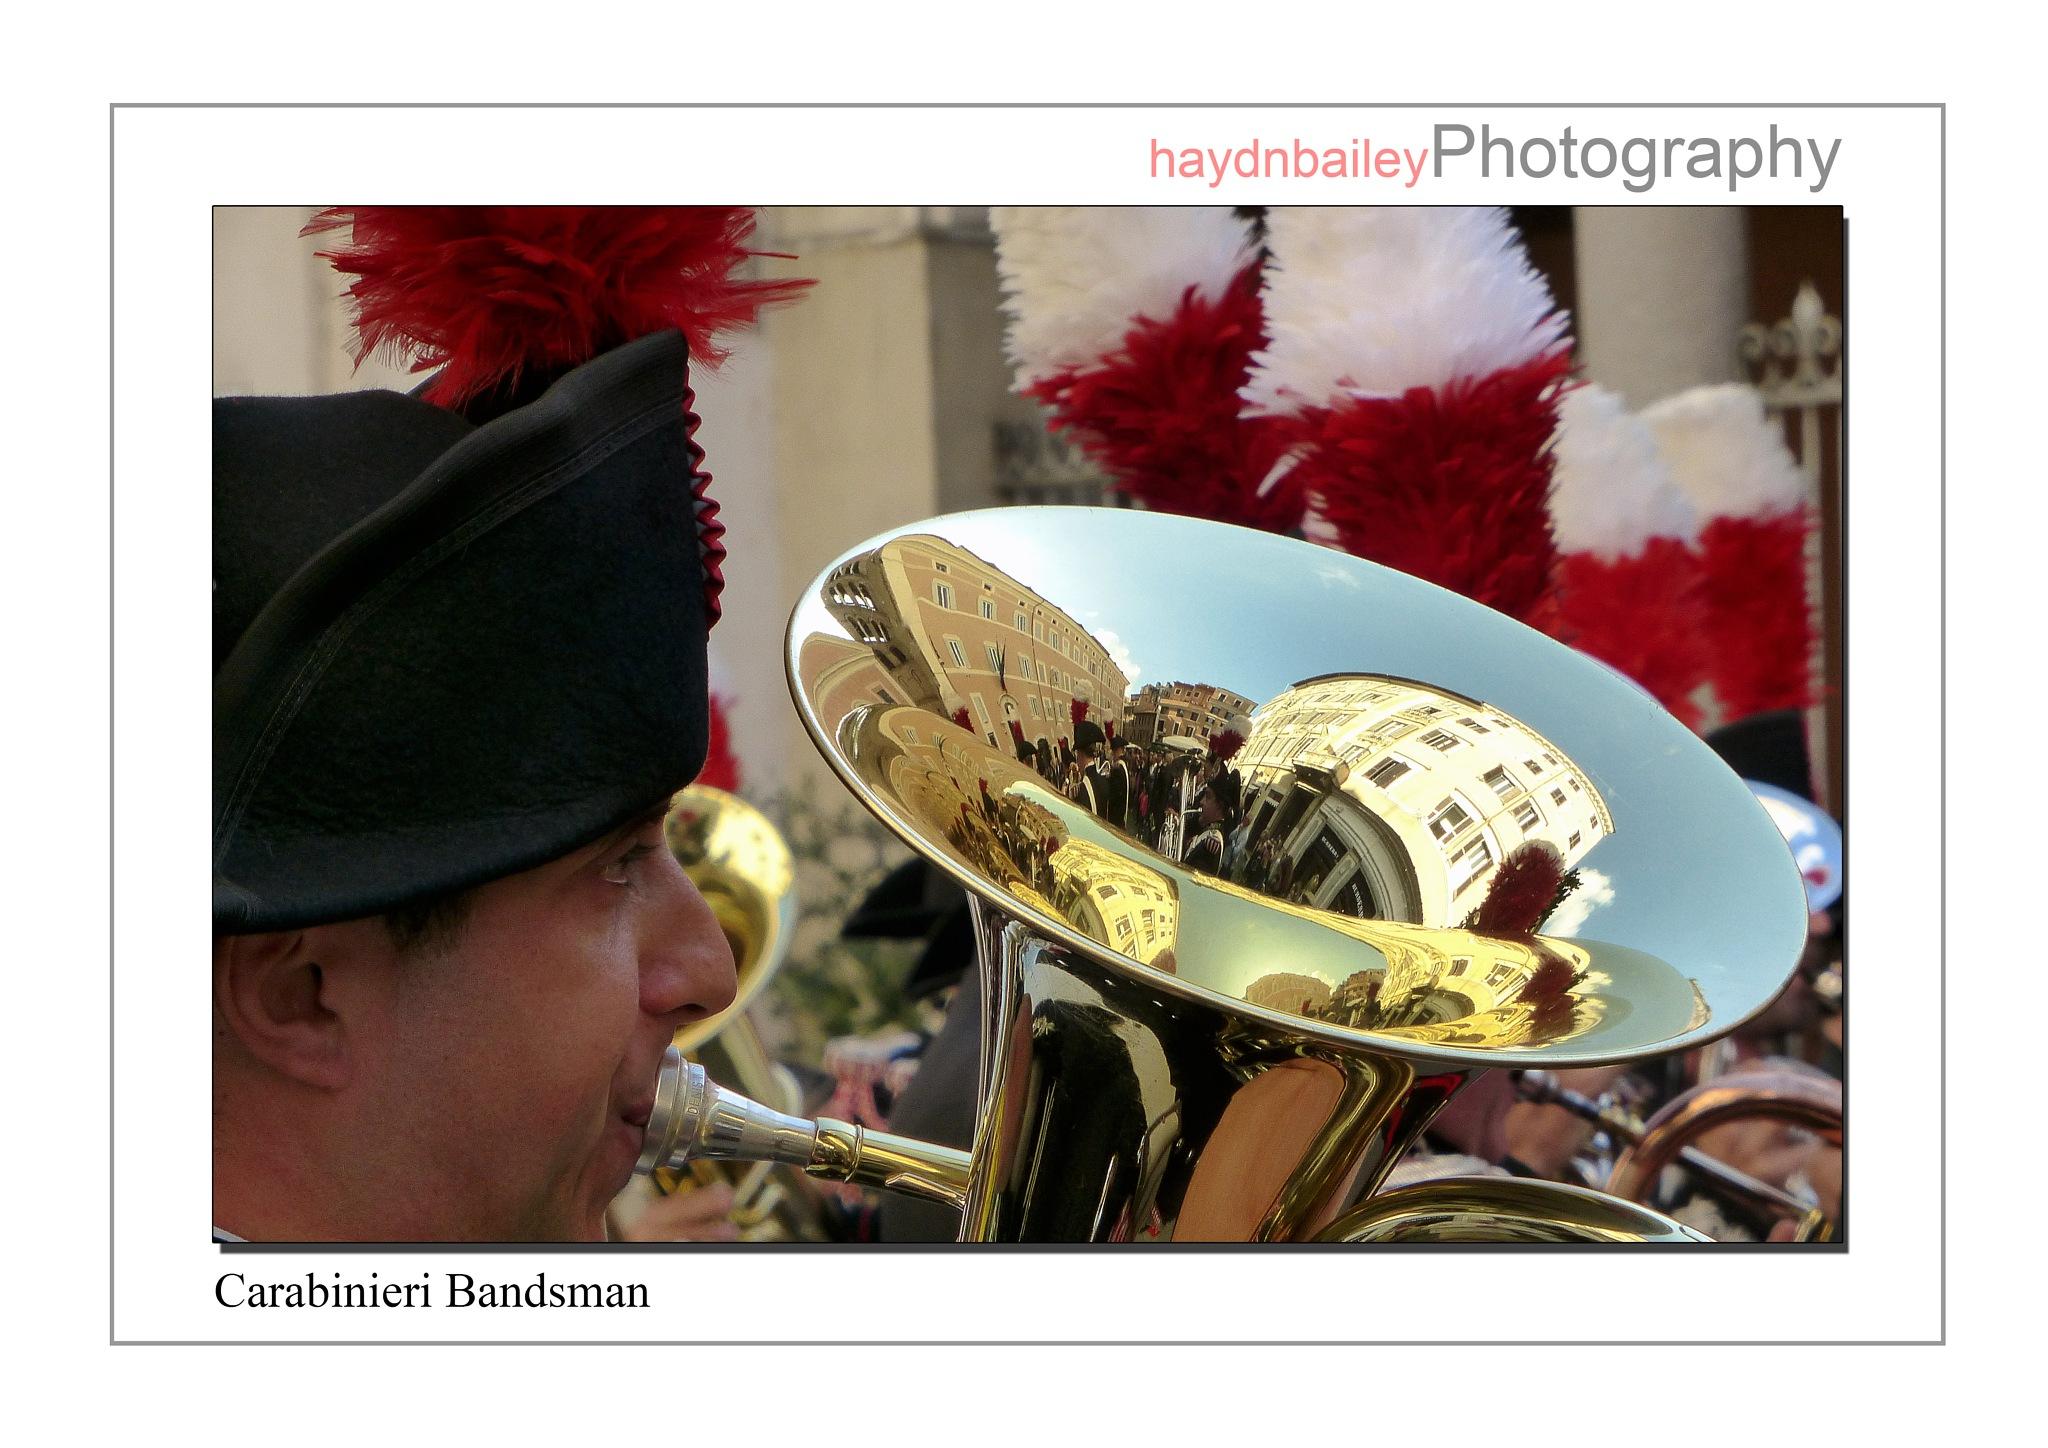 Carabinieri Bandsman by Haydn Bailey